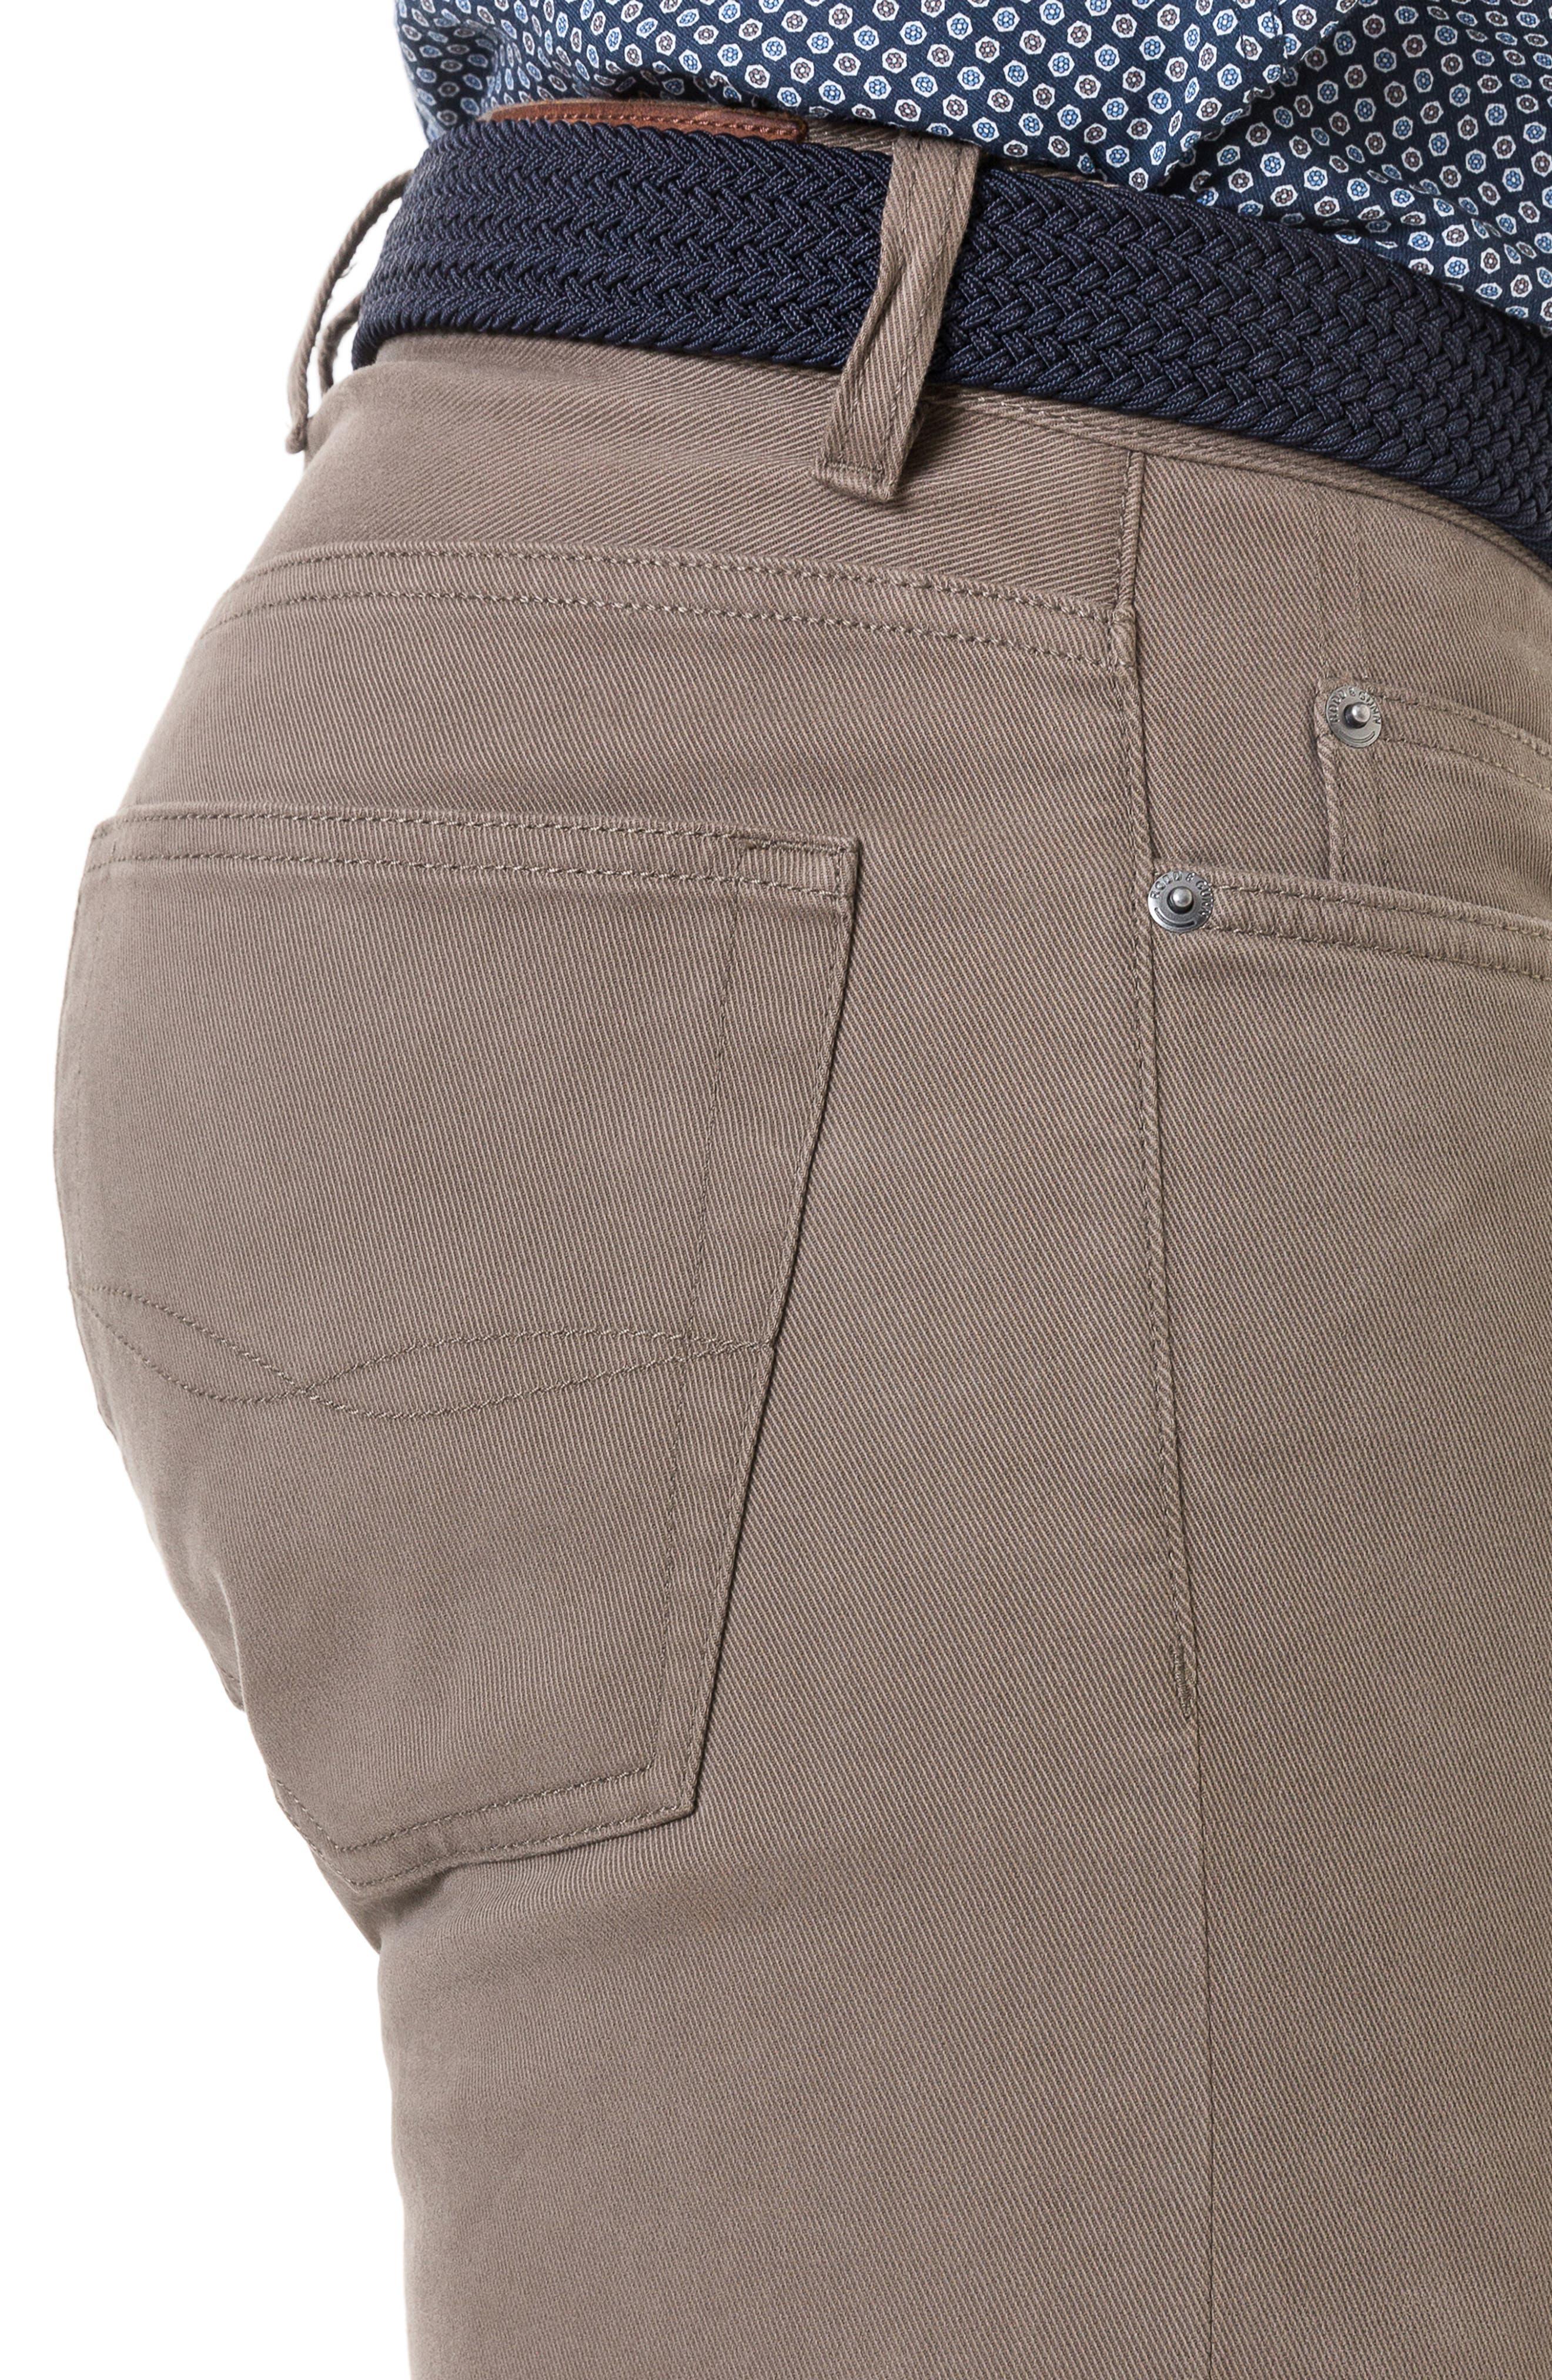 Hawdon Straight Leg Jeans,                             Alternate thumbnail 2, color,                             CLAY